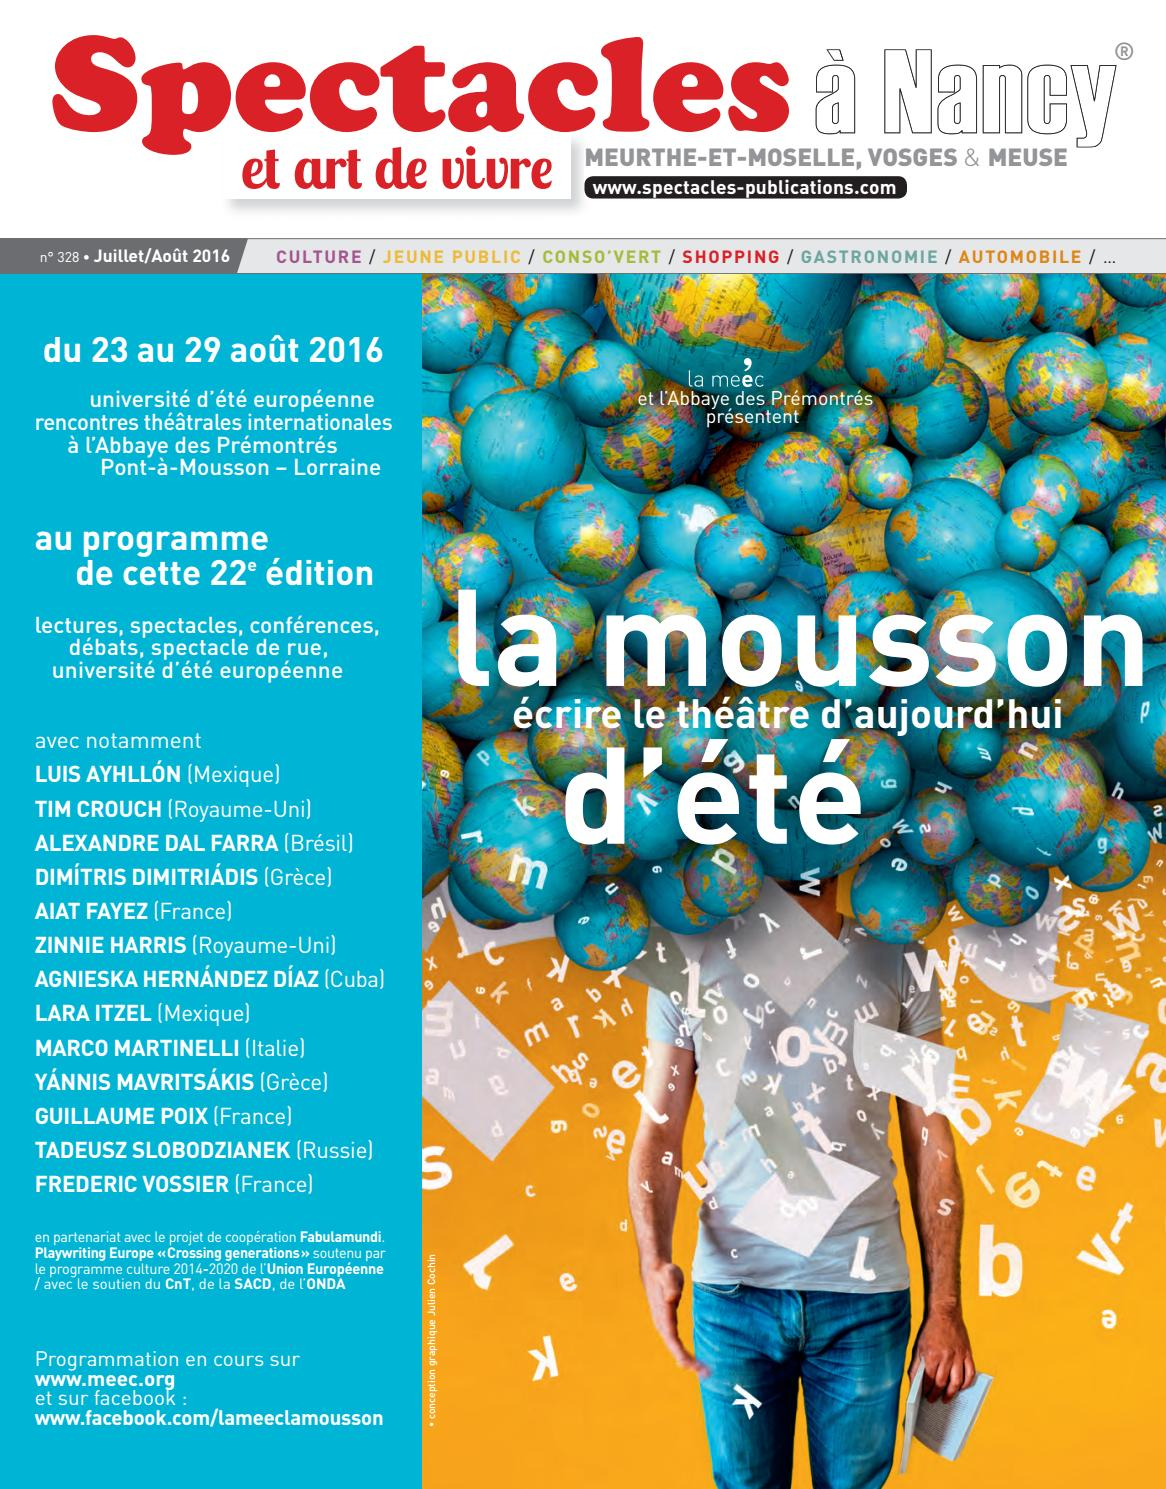 Spectacles Publications Nancy n°328   Juillet-Août 2016 by SPECTACLES  PUBLICATIONS - issuu 432f9e88281